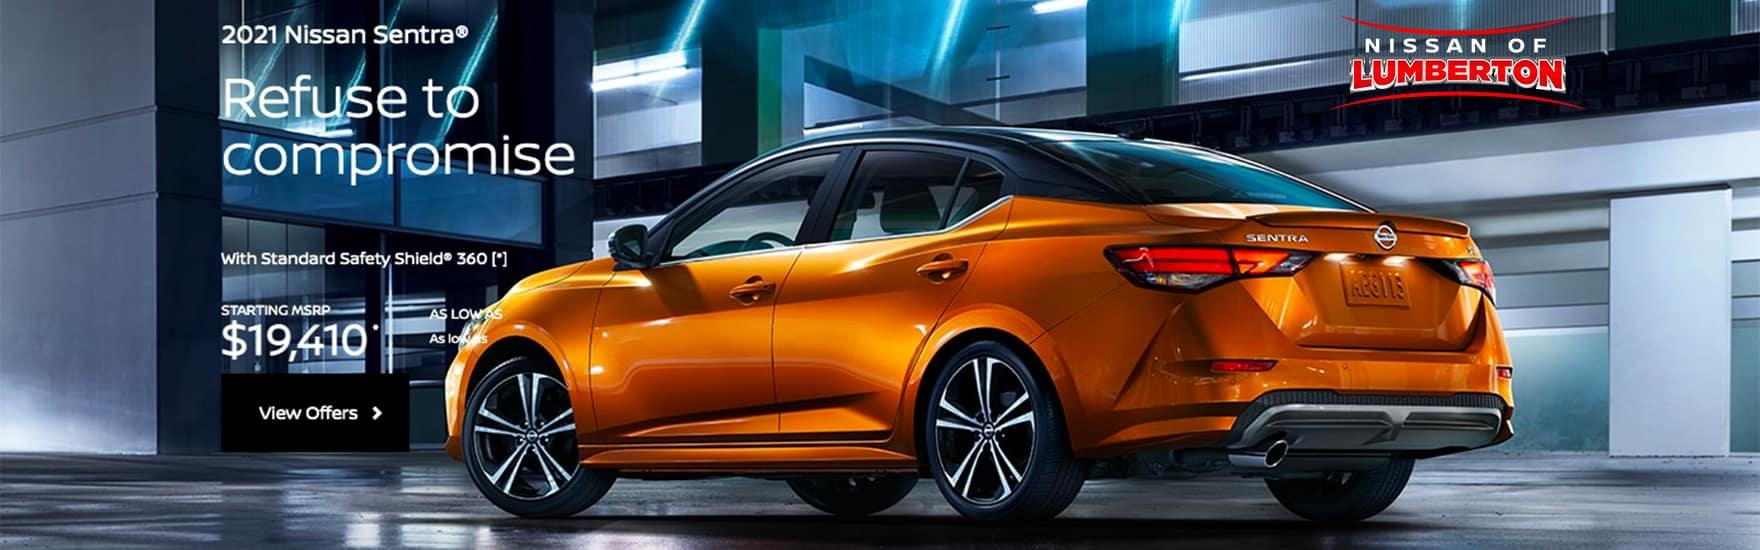 Nissan-of-lumberton-sentra-offer